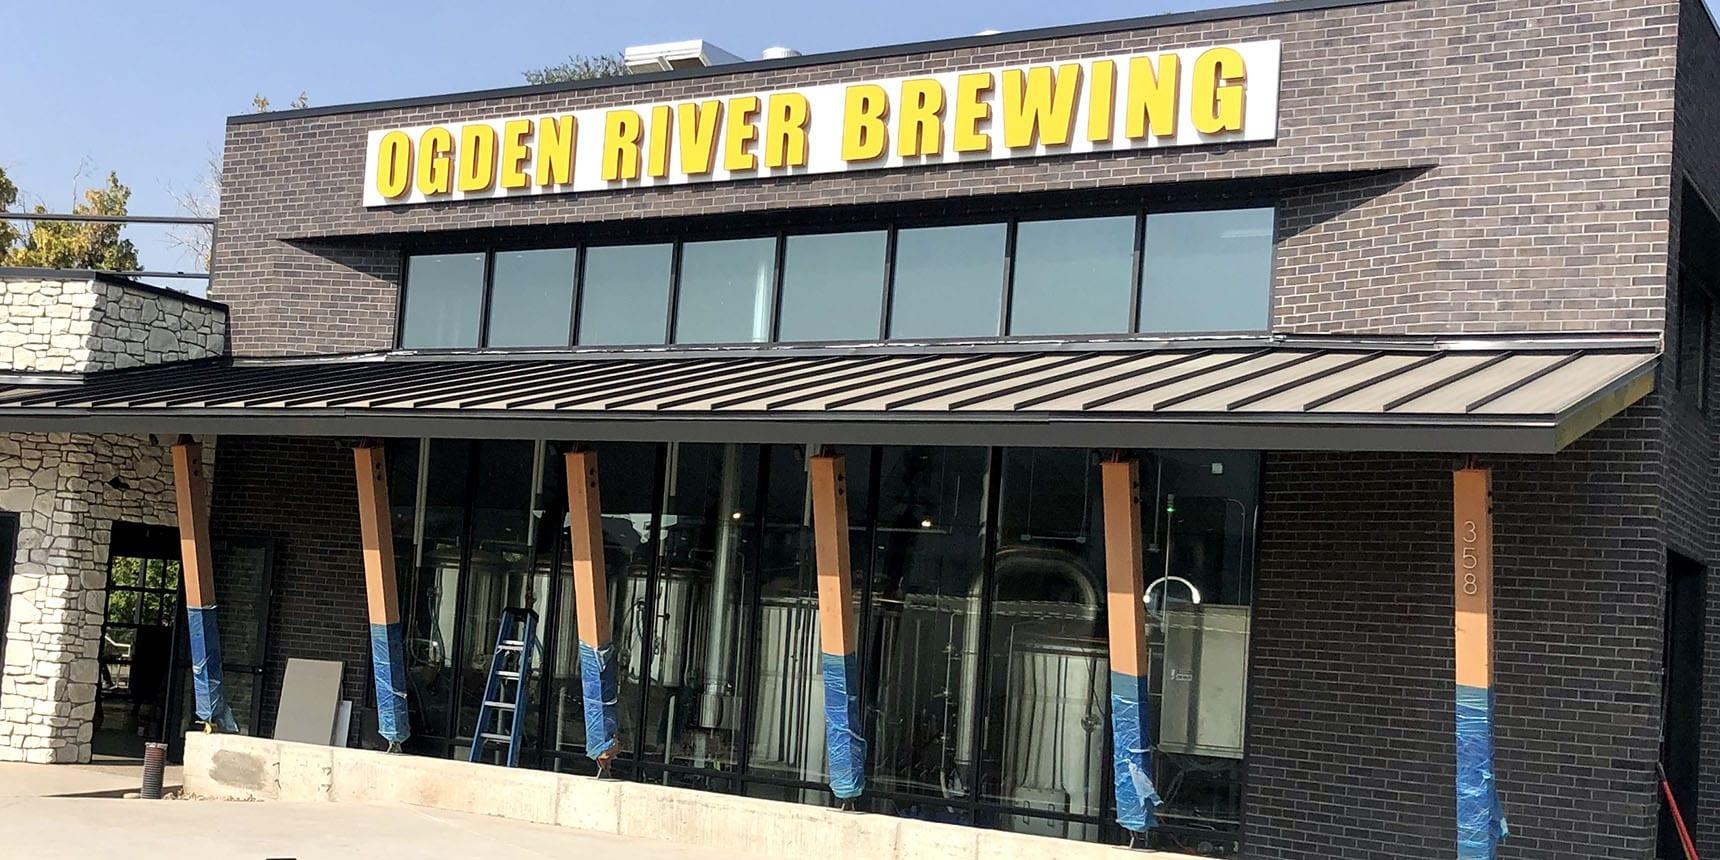 Exterior of Ogden River Brewing - Oct. 6, 2020